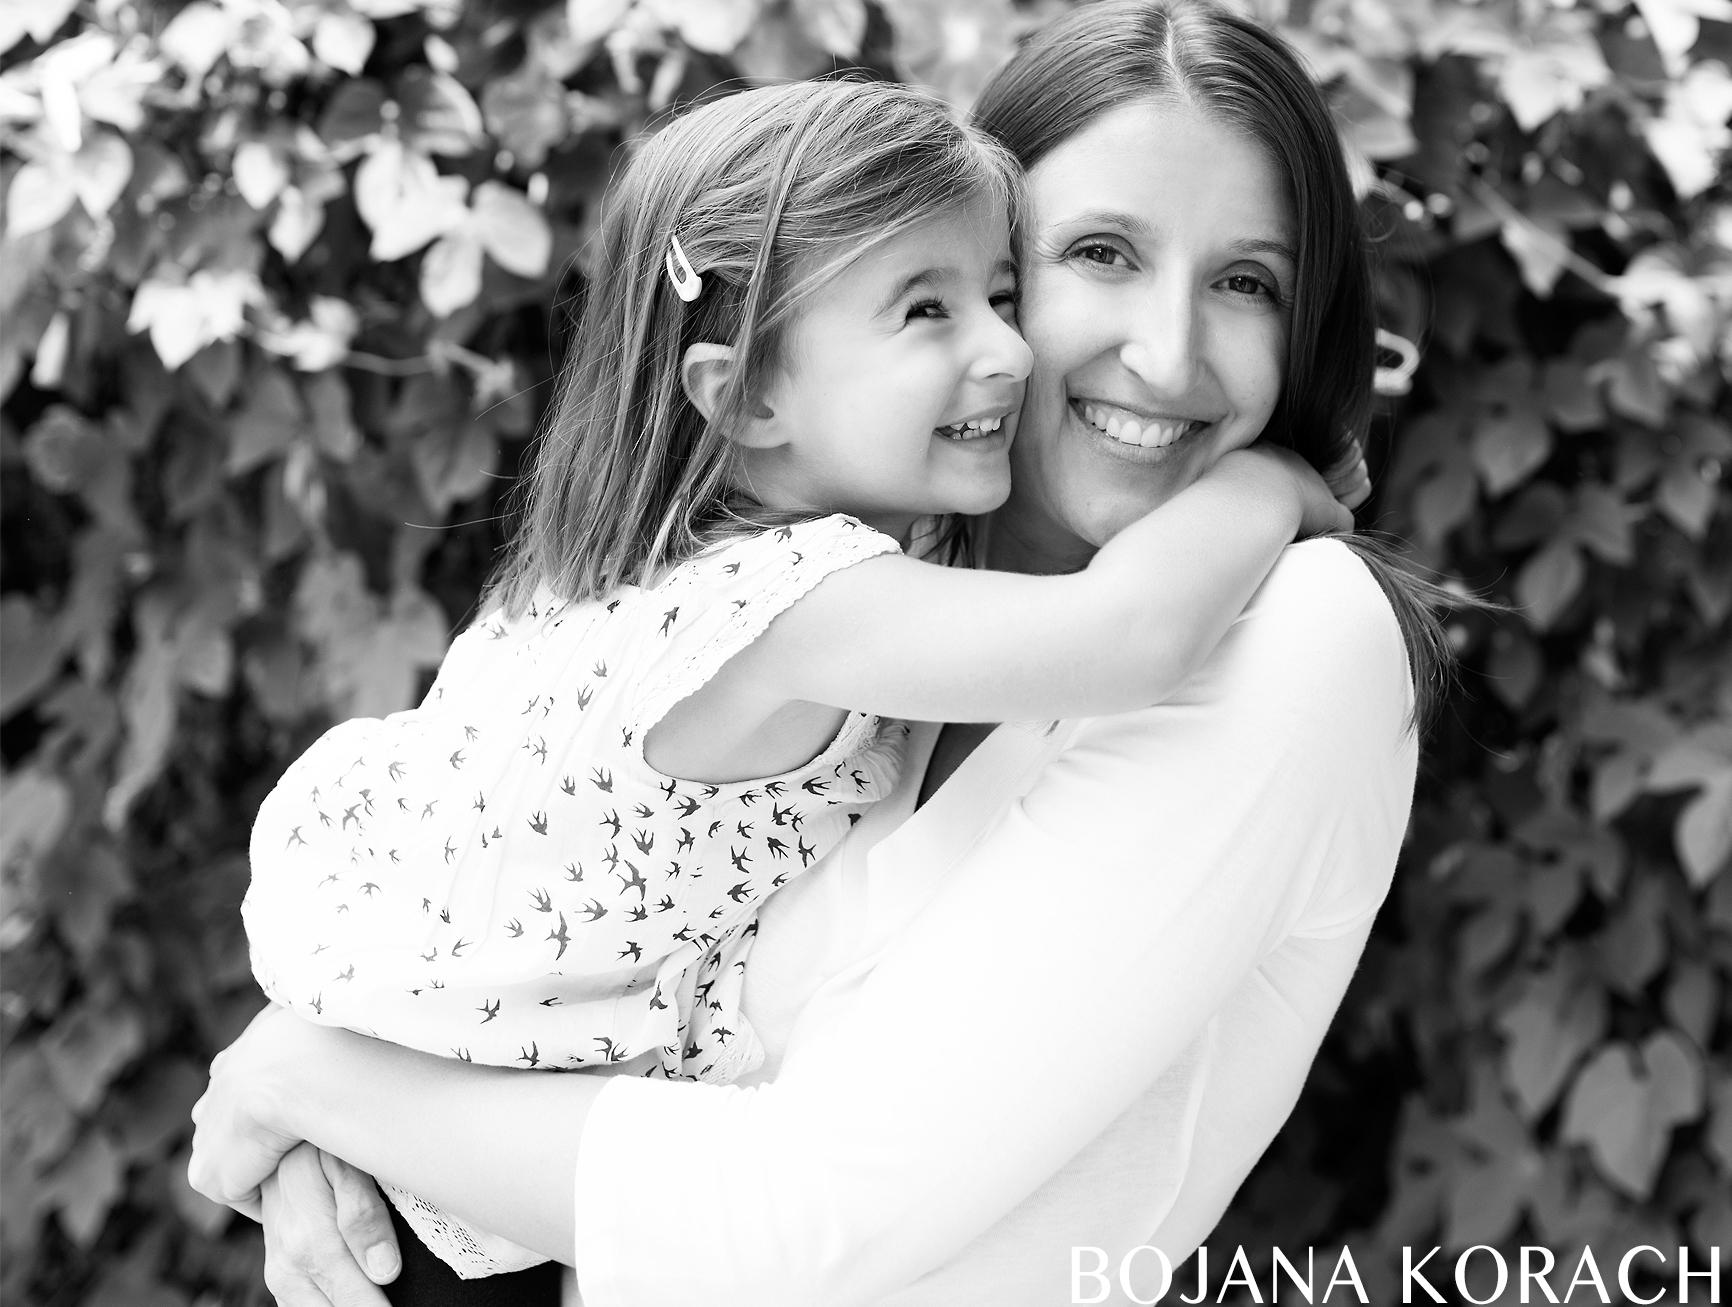 marin-county-family-photographer-4